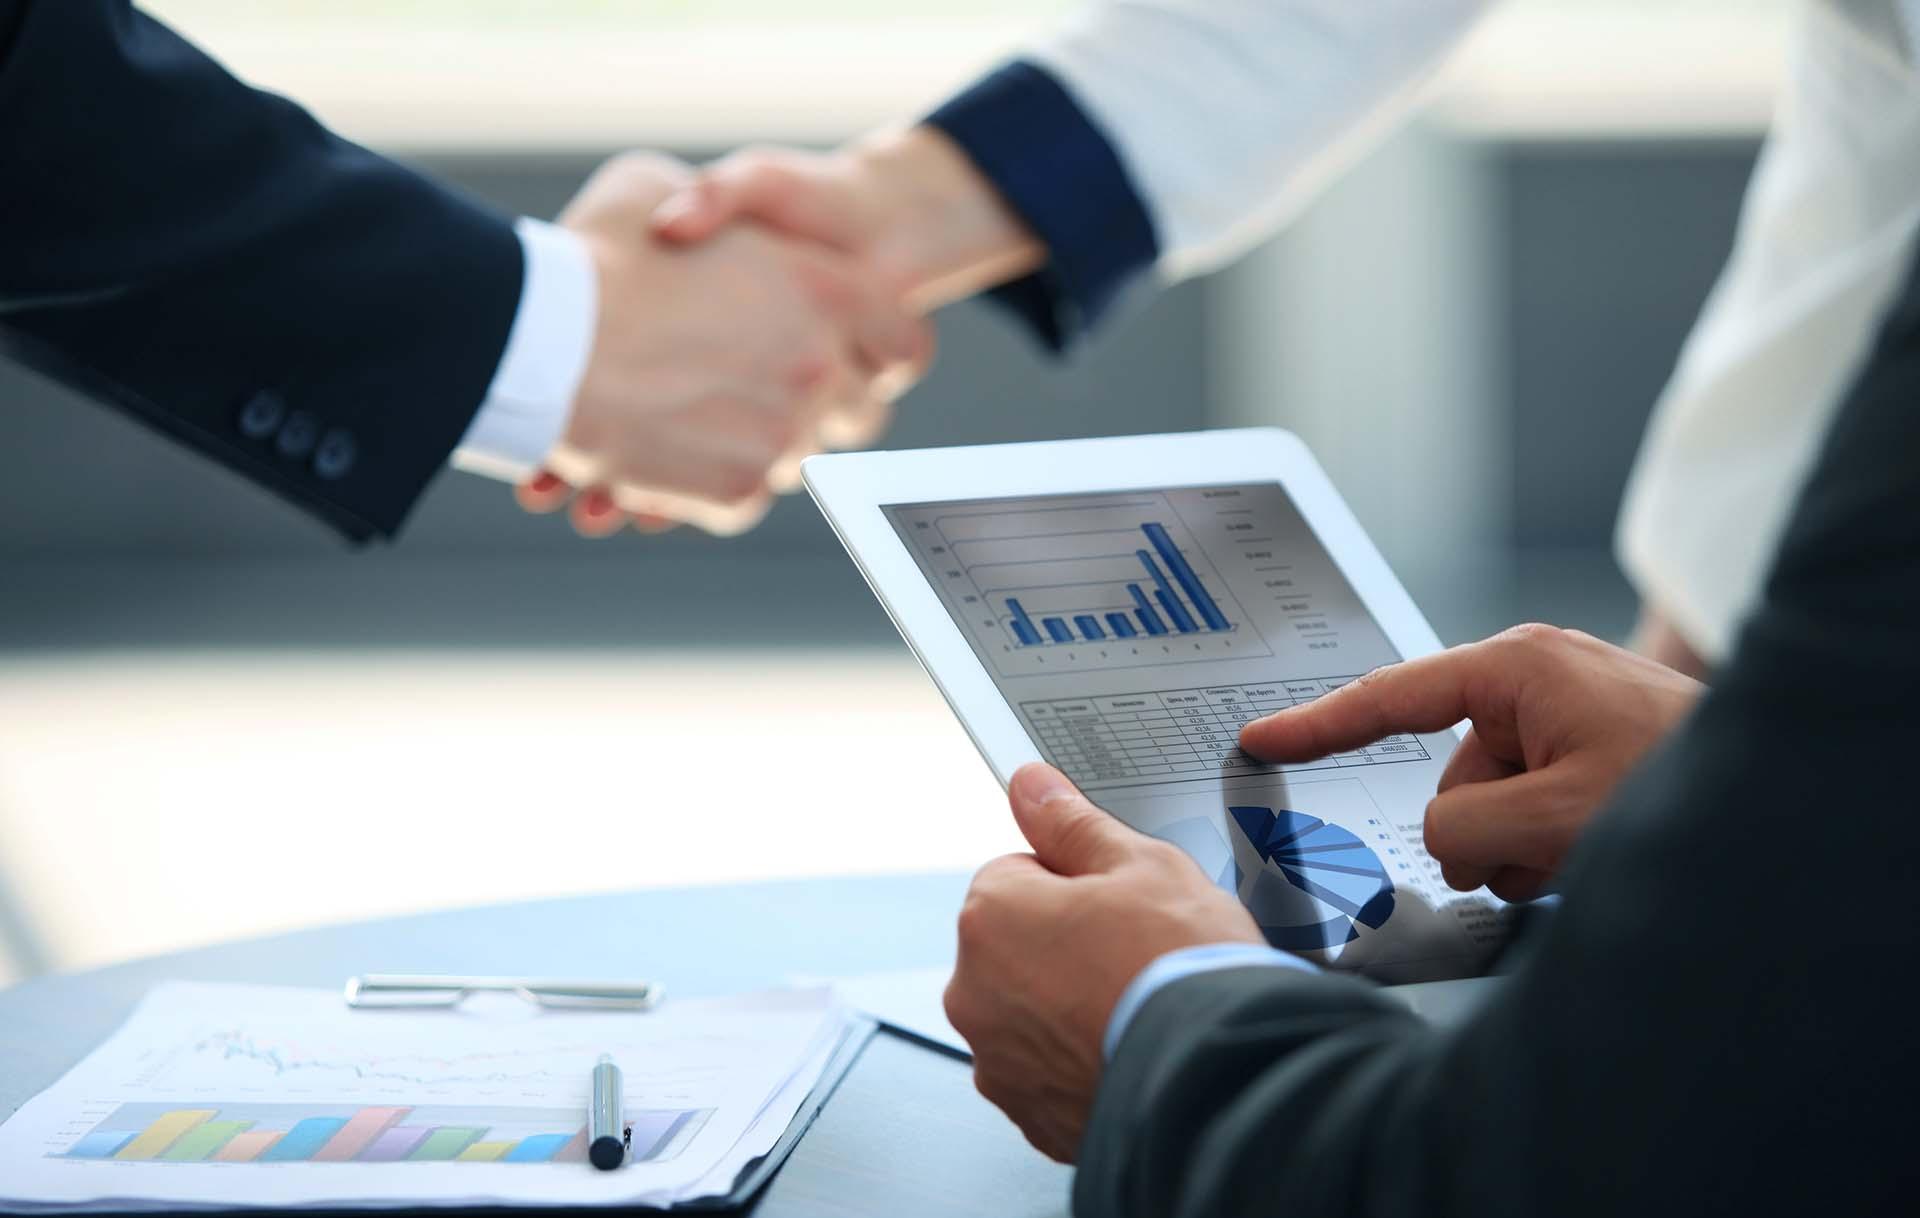 Business associates shaking hands in office    Bild (Ausschnitt): © Tsyhun / Dreamstime [Royalty Free]  - Dreamstime.com